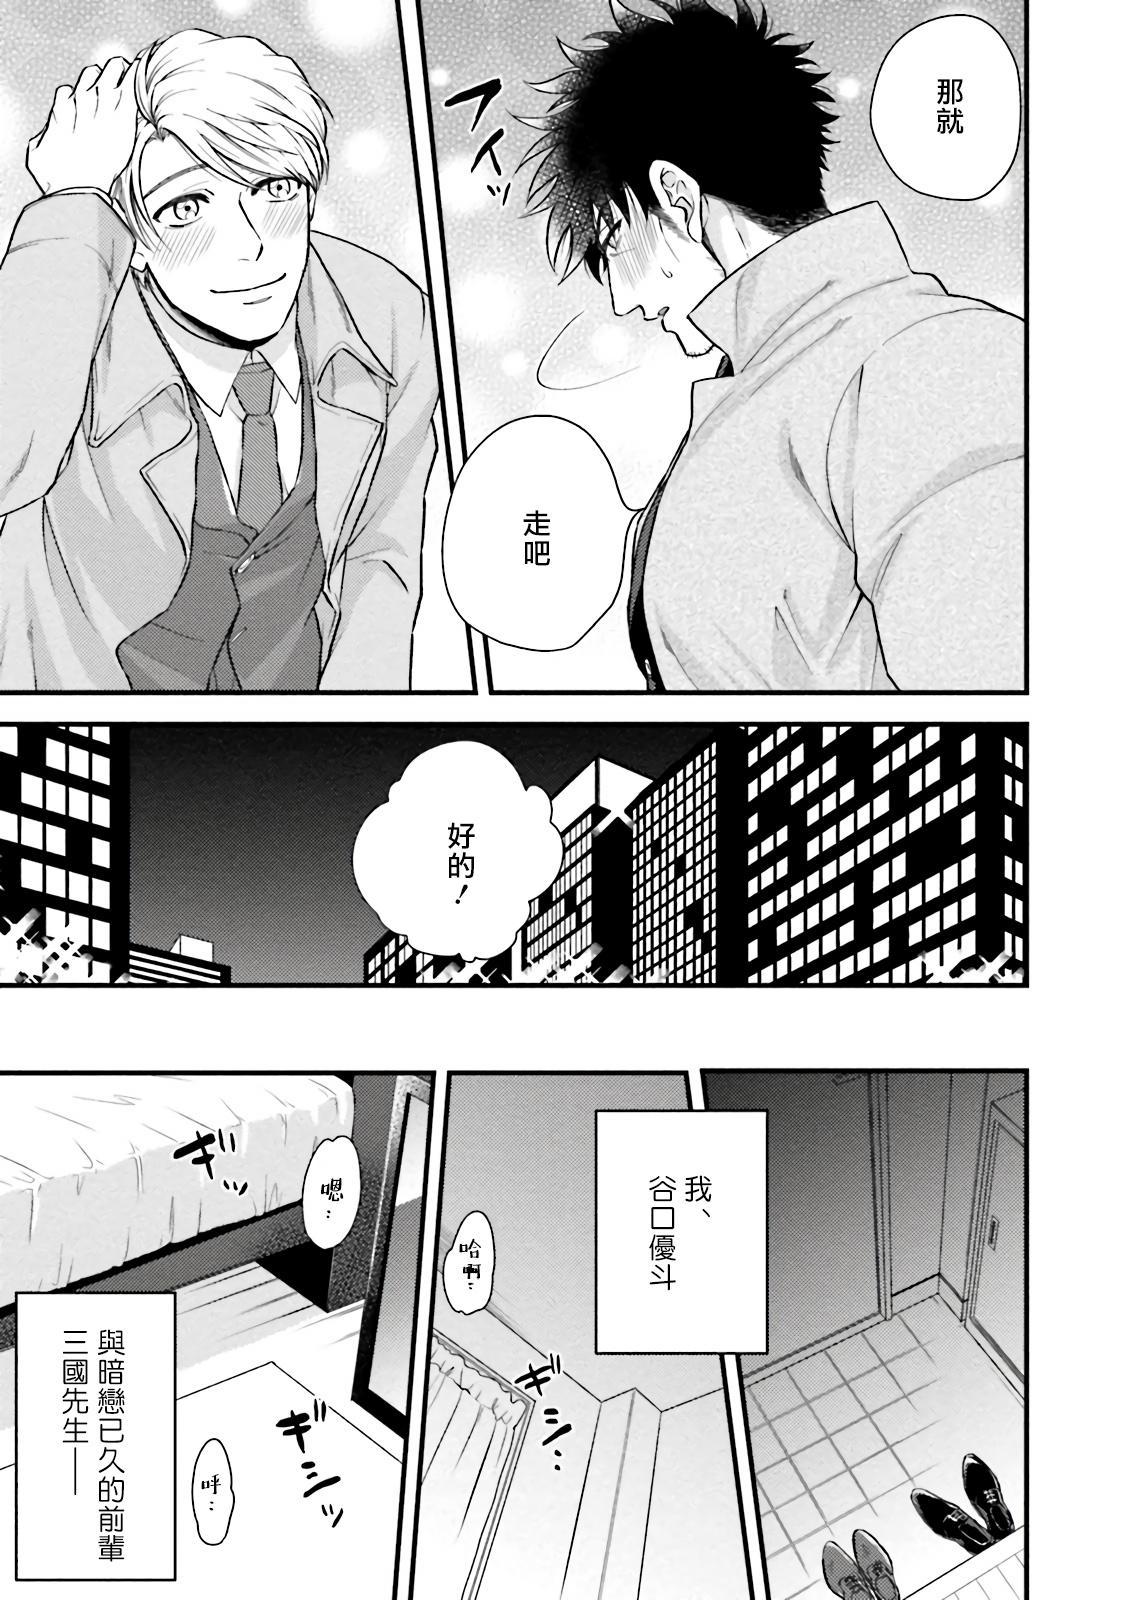 Kinou wa Otanoshimi Deshita ne | 昨天过得很愉快吧 Ch. 1-4+特典 133